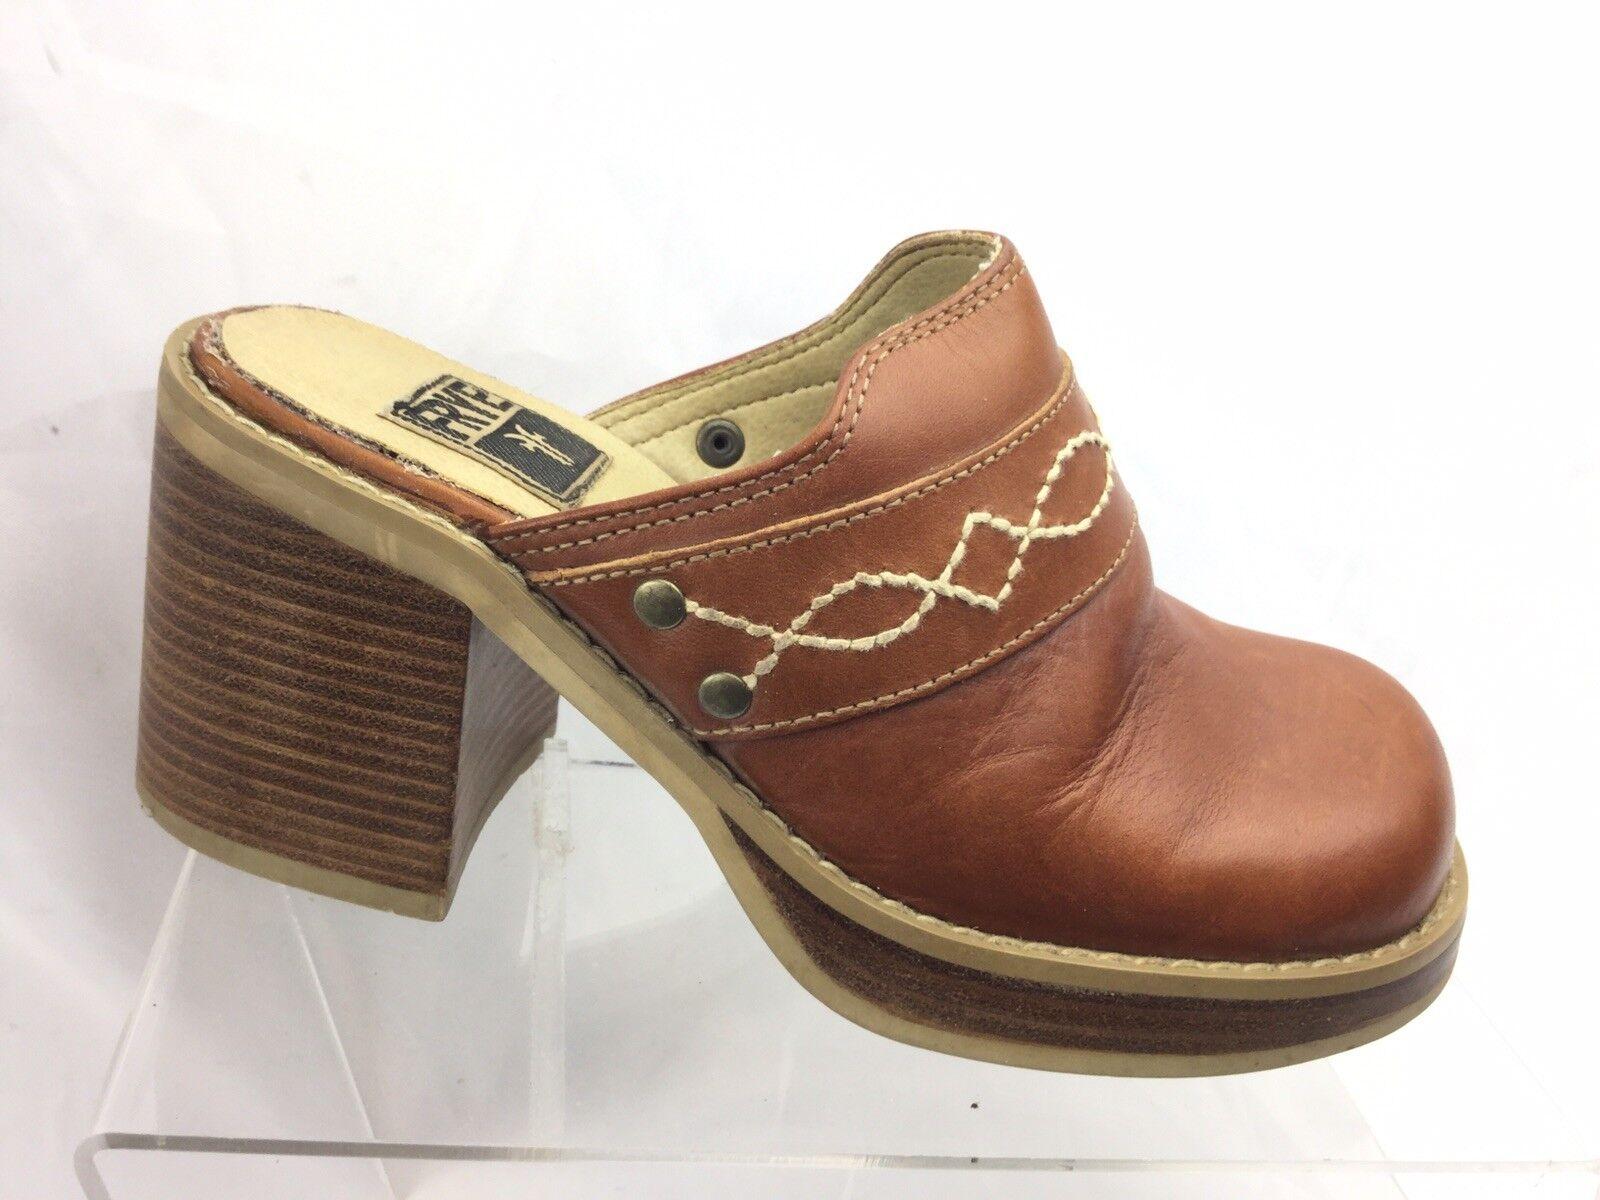 Frye Vintage Brown Camel Tan  Platform High Heeled Clogs Sz 6M Dusty 73810